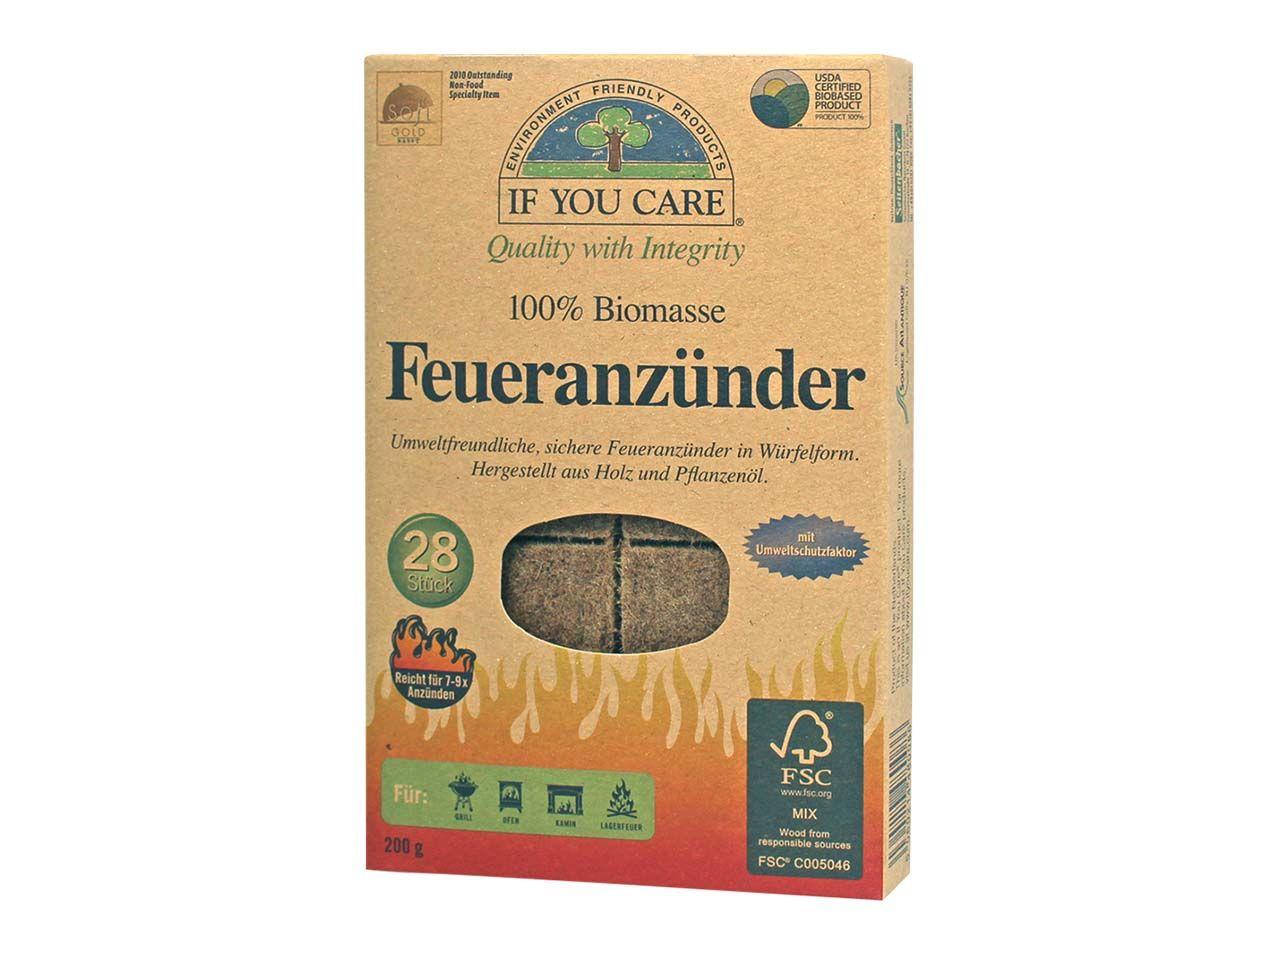 IF YOU CARE Grillanzünder, 28 Stk. 480086